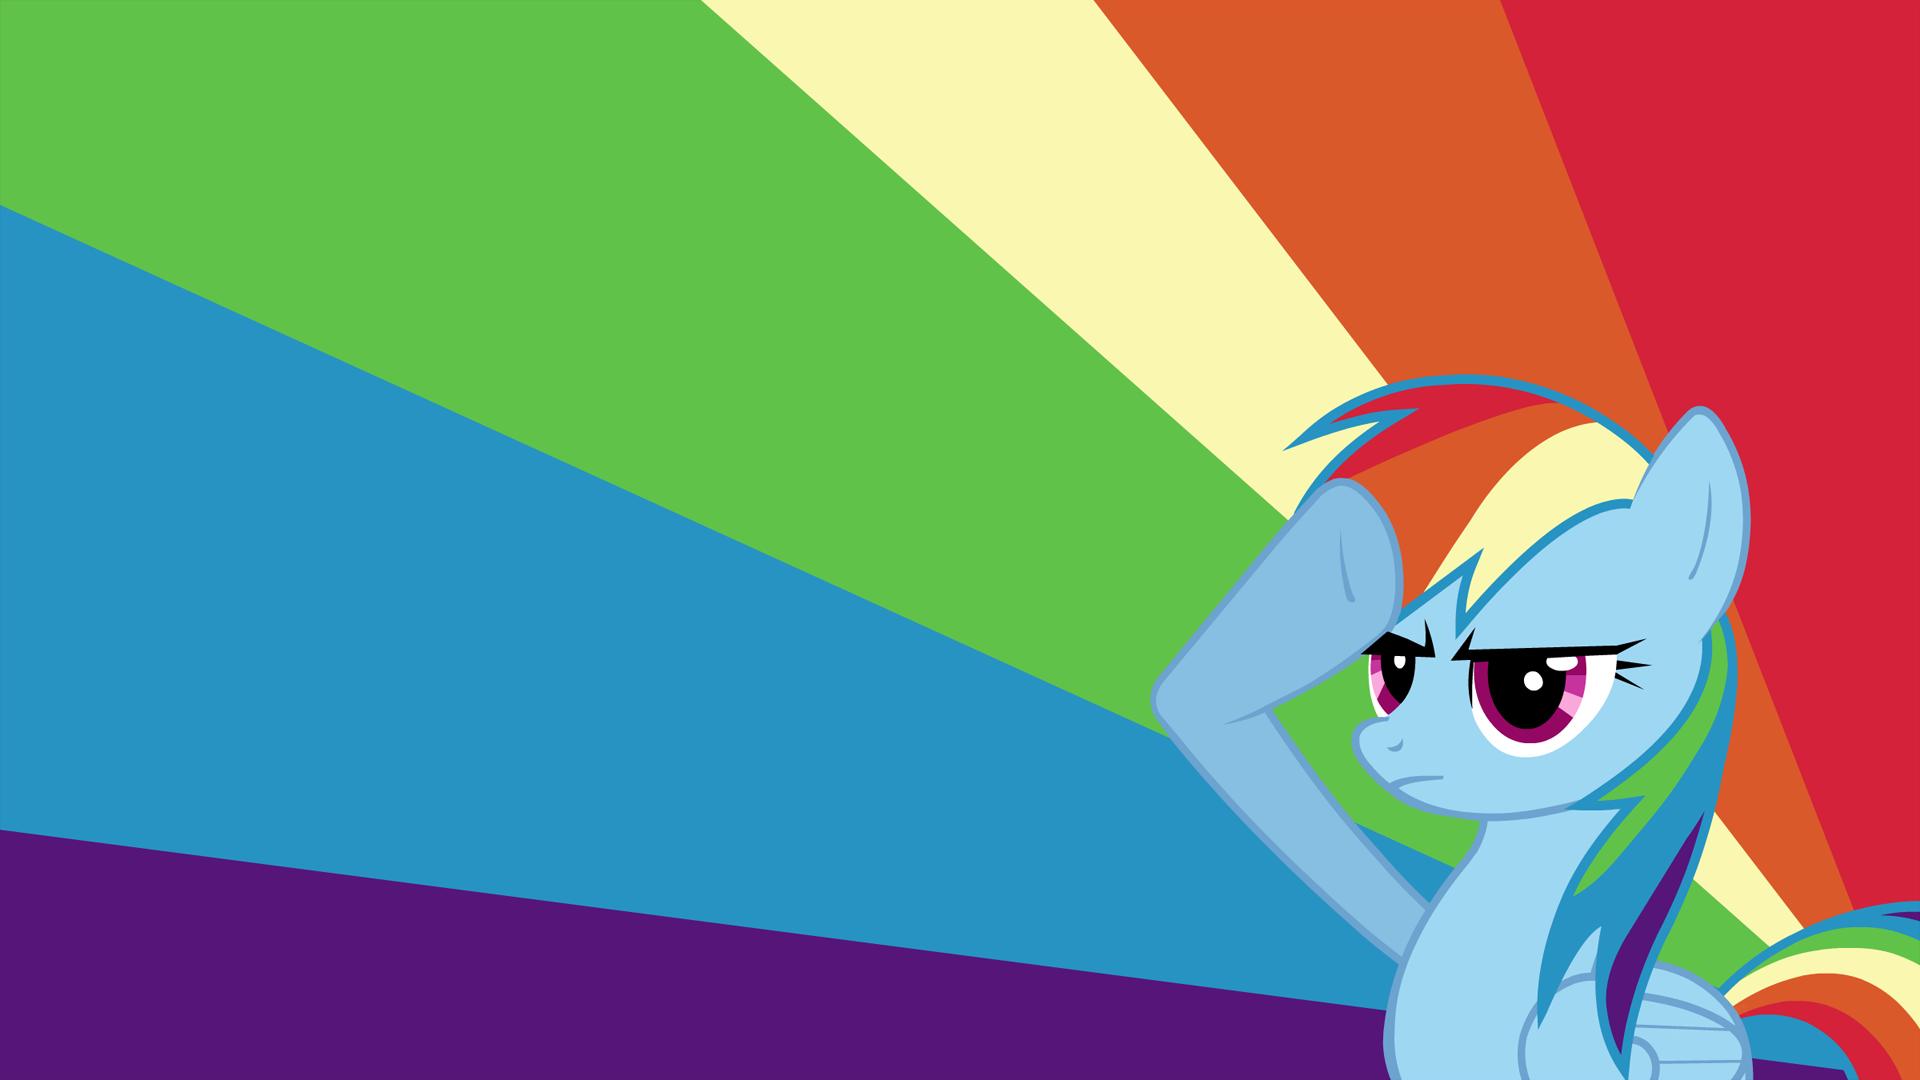 Rainbow Dash Wallpaper 16157 1920x1080 px HDWallSourcecom